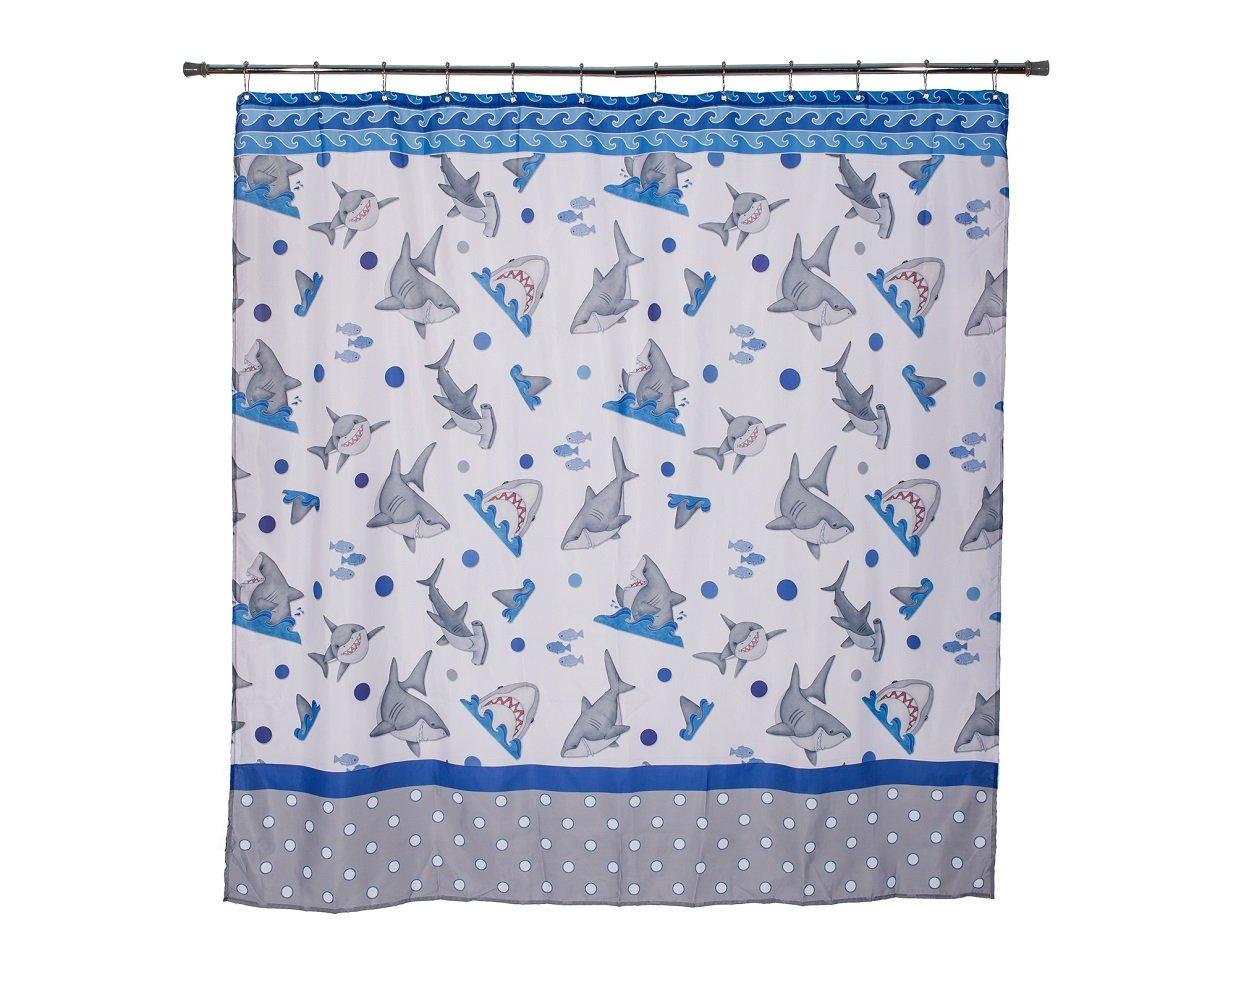 Borders Unlimited Fish 'N Sharks-Mini Polka Dot Shower Curtain